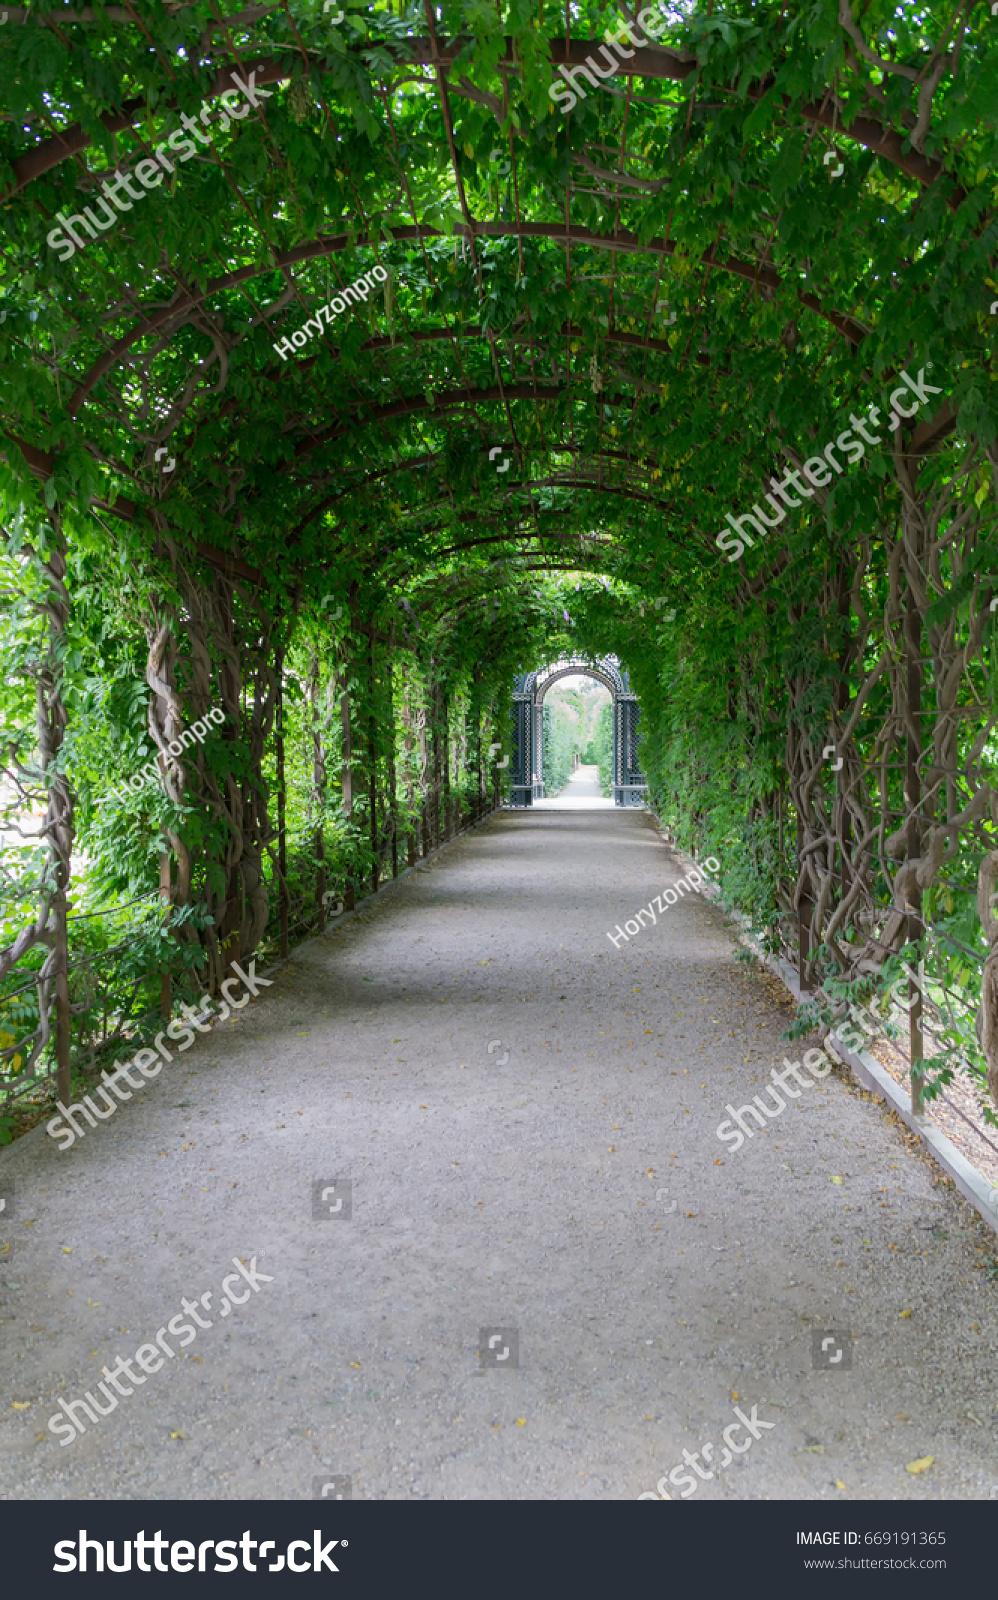 Garden Arc Of The Green Plants